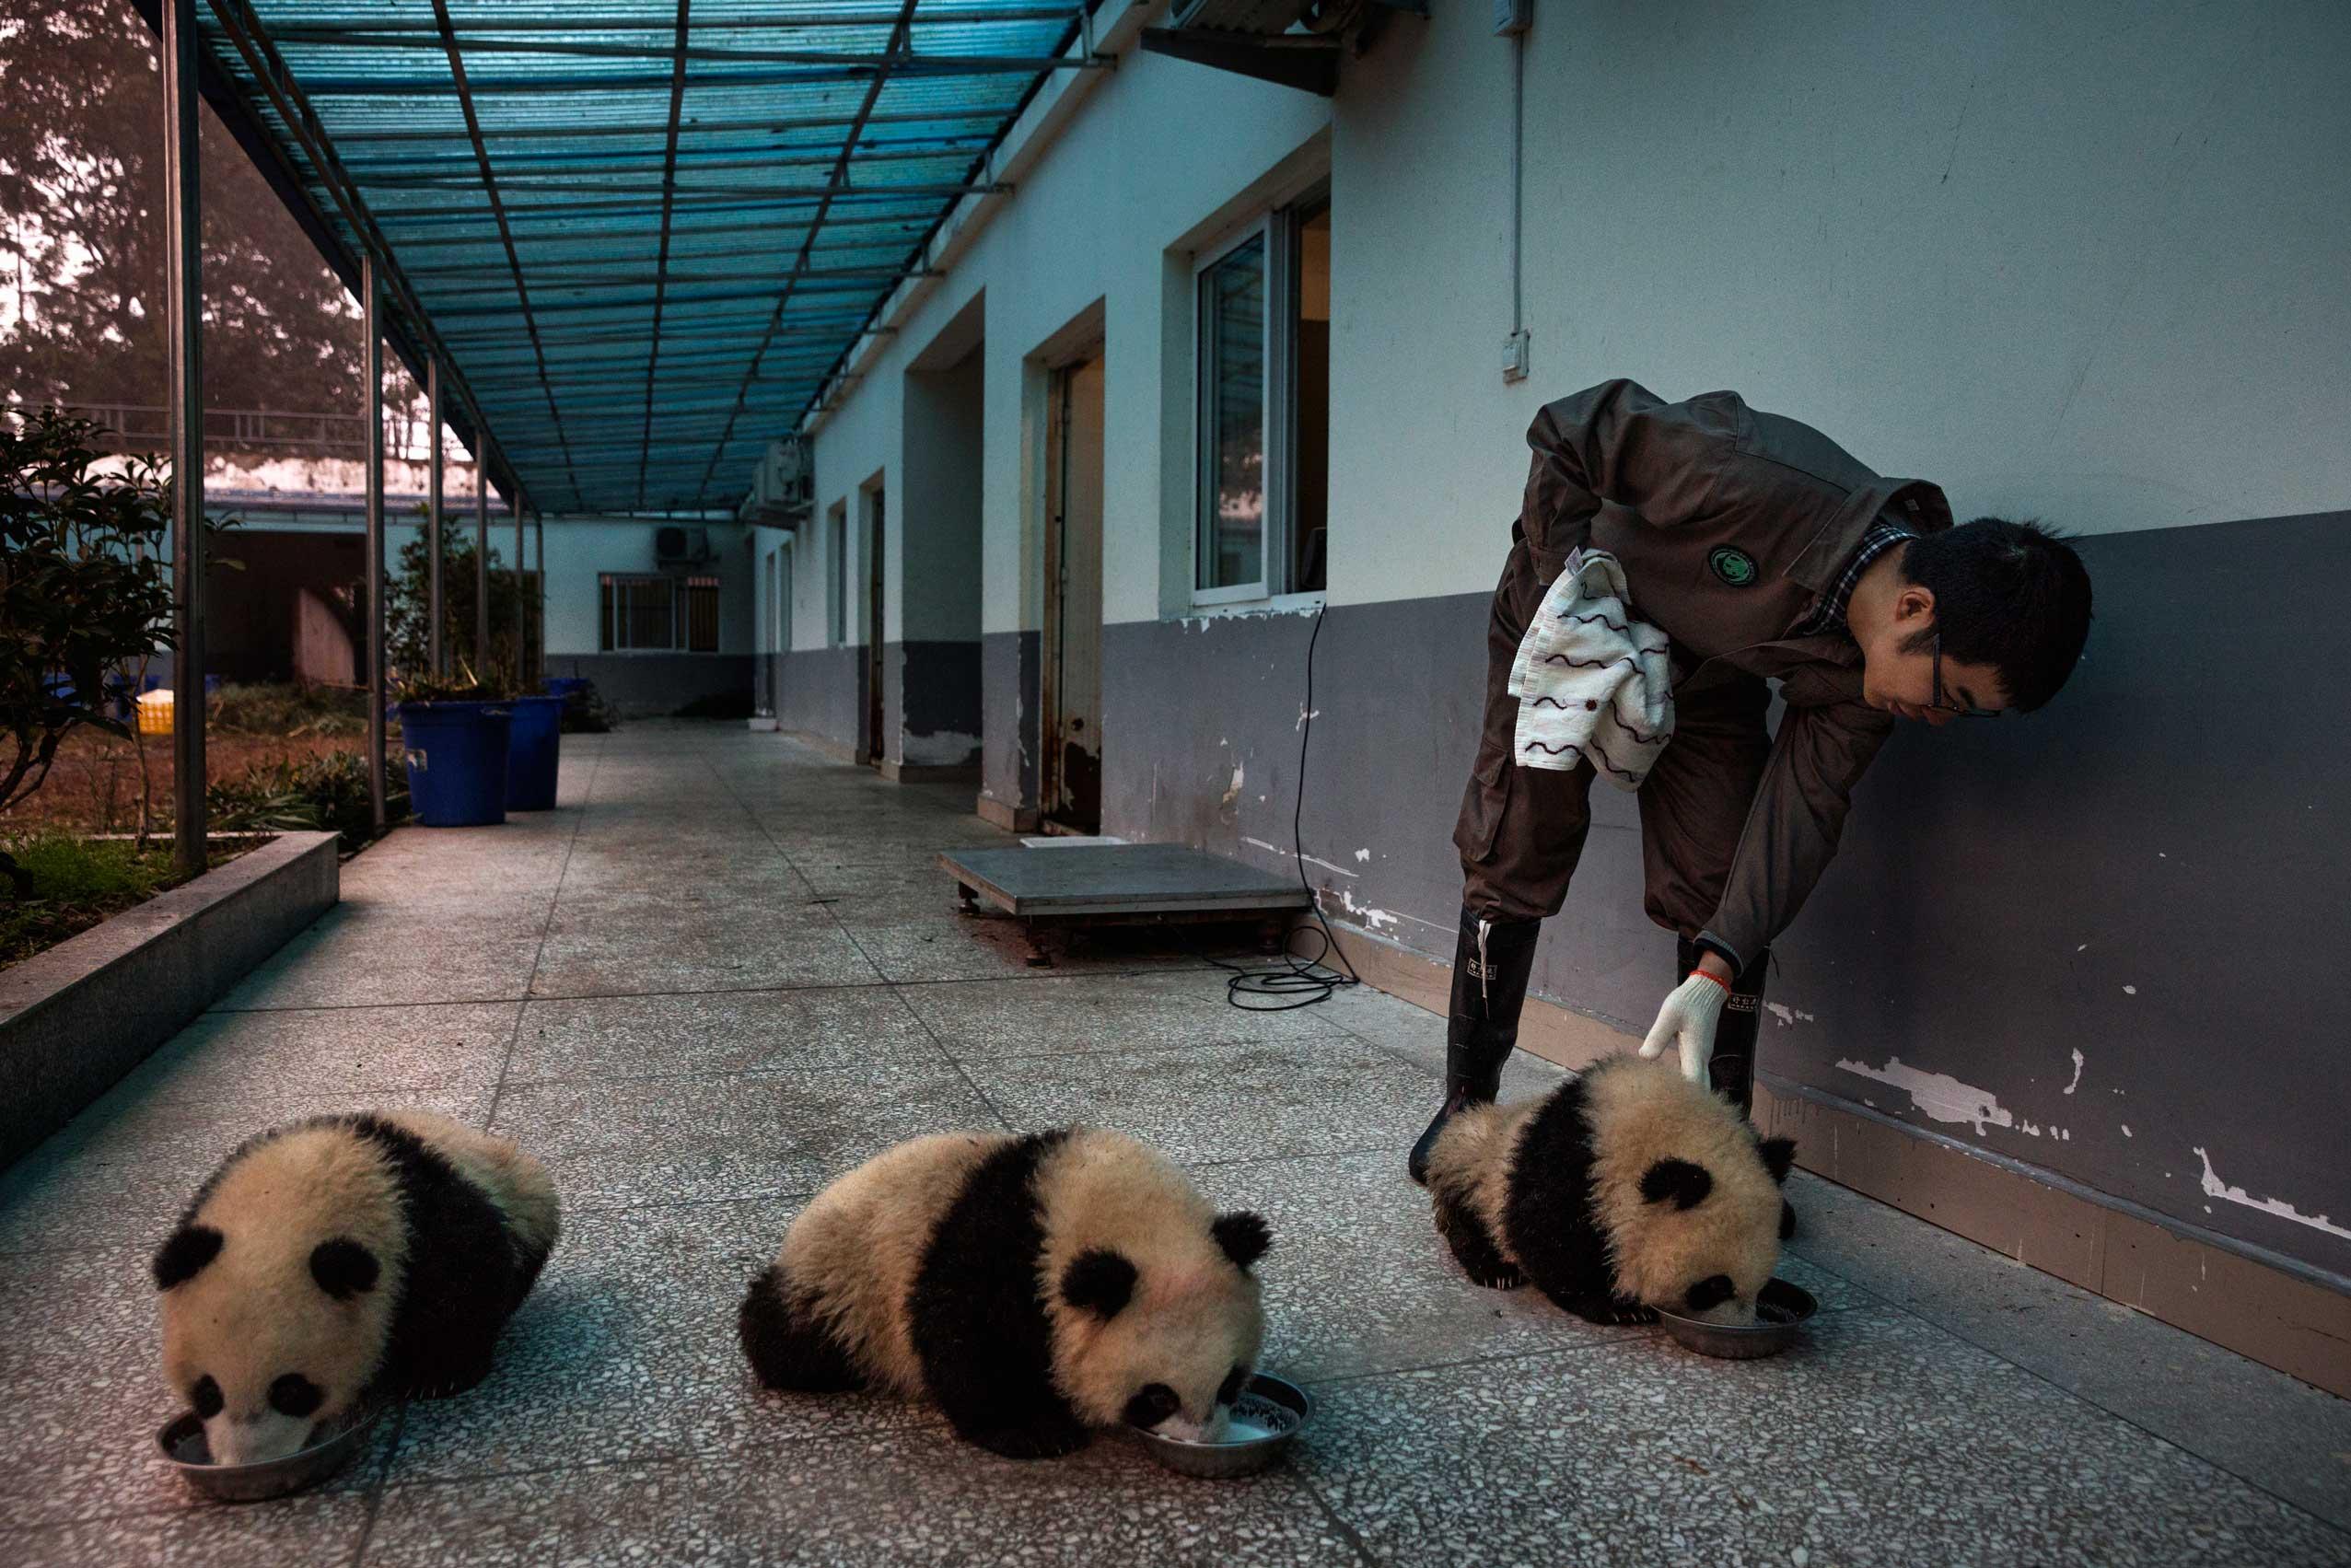 Milk is fed to baby pandas at the Bifengxia Panda Base, Dec. 3, 2015.